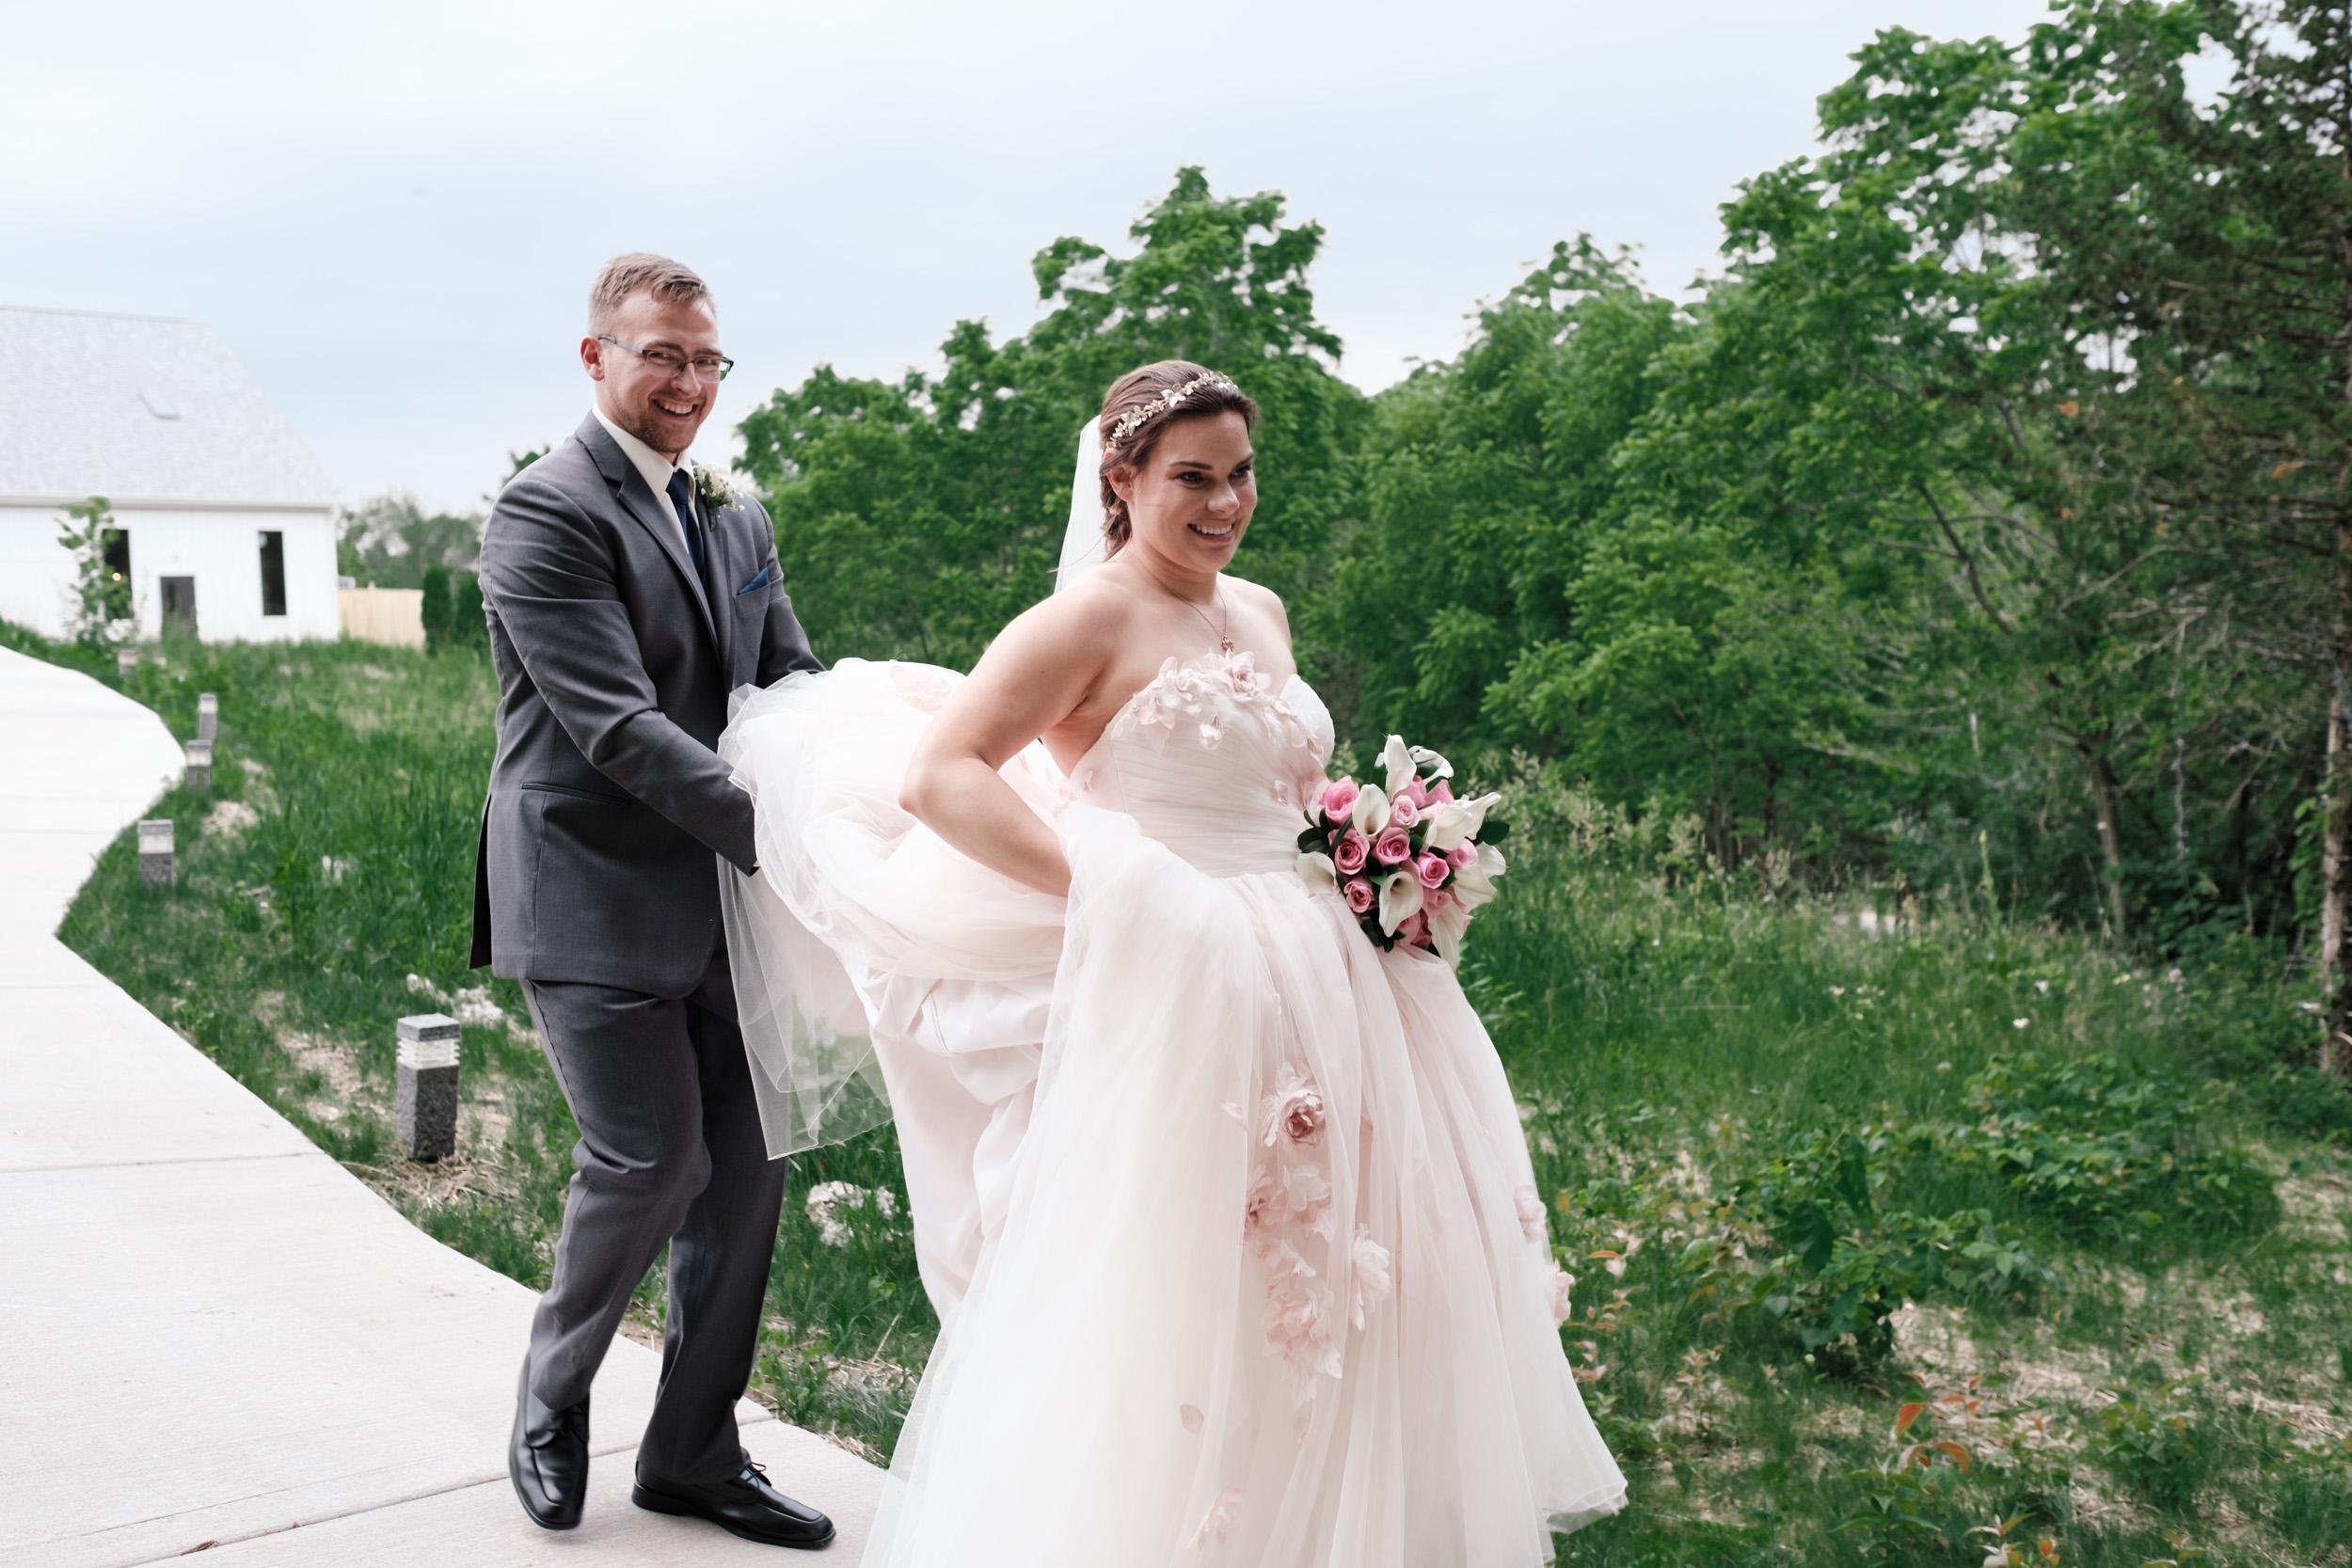 19-06-22-Ryan-Katie-The-Fields-Reserve-Wedding-37.jpg